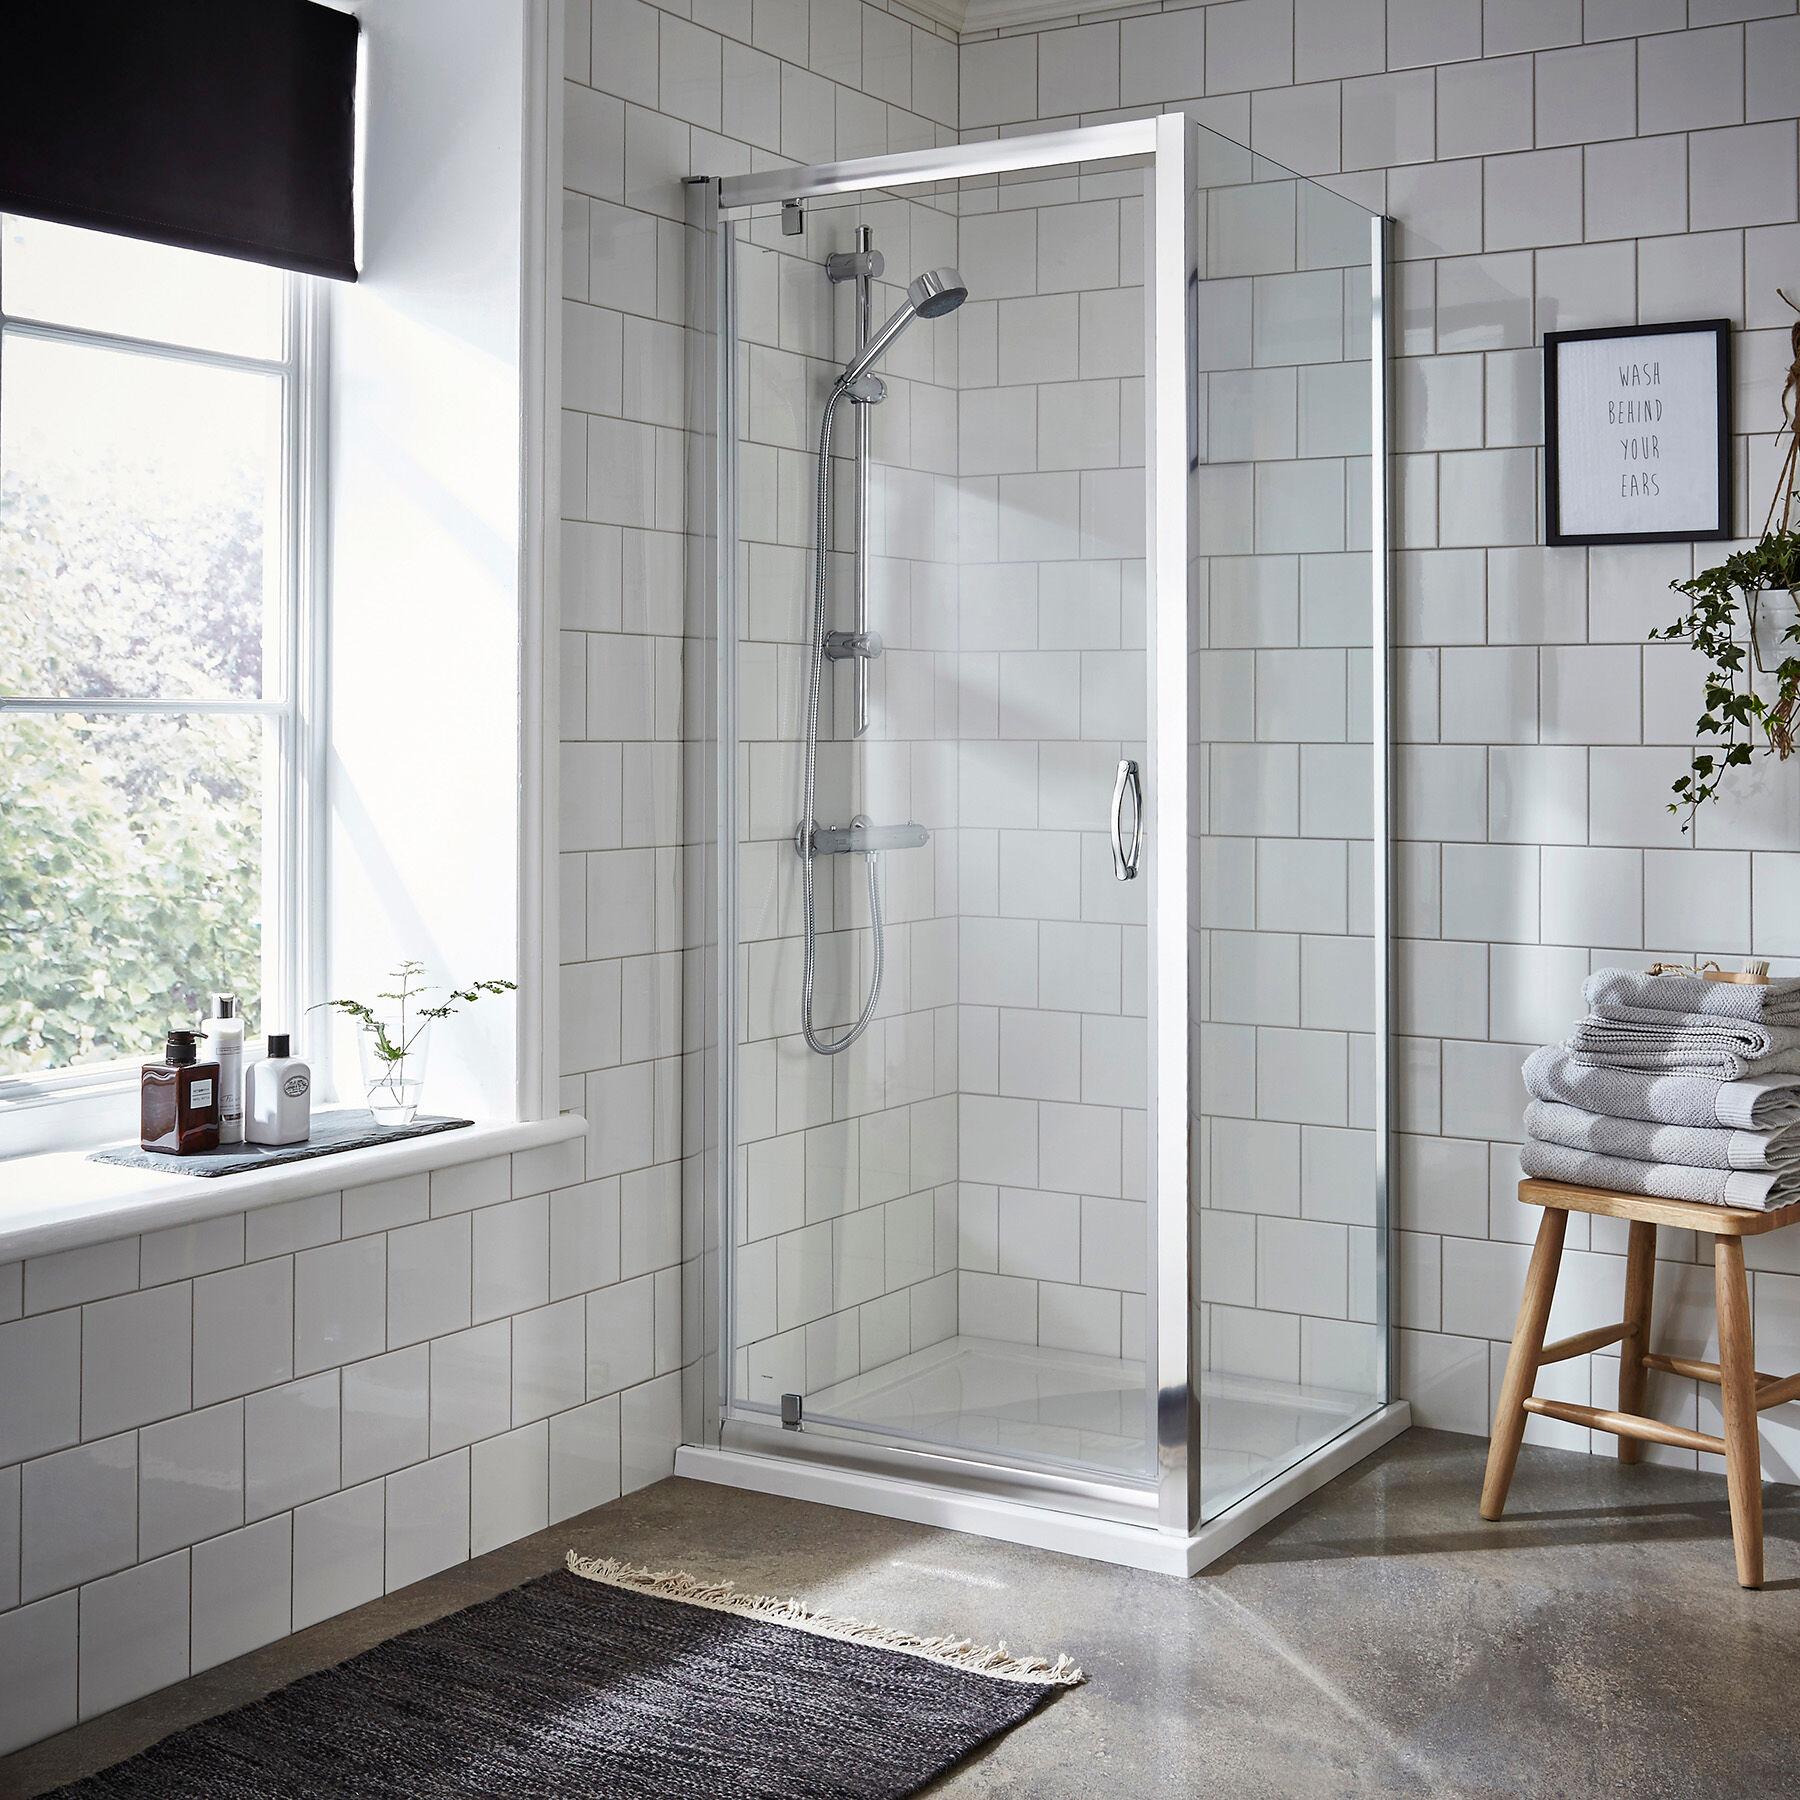 Royal Bathrooms Ella 5mm Pivot Enclosure with Pearlstone Tray - Various Sizes